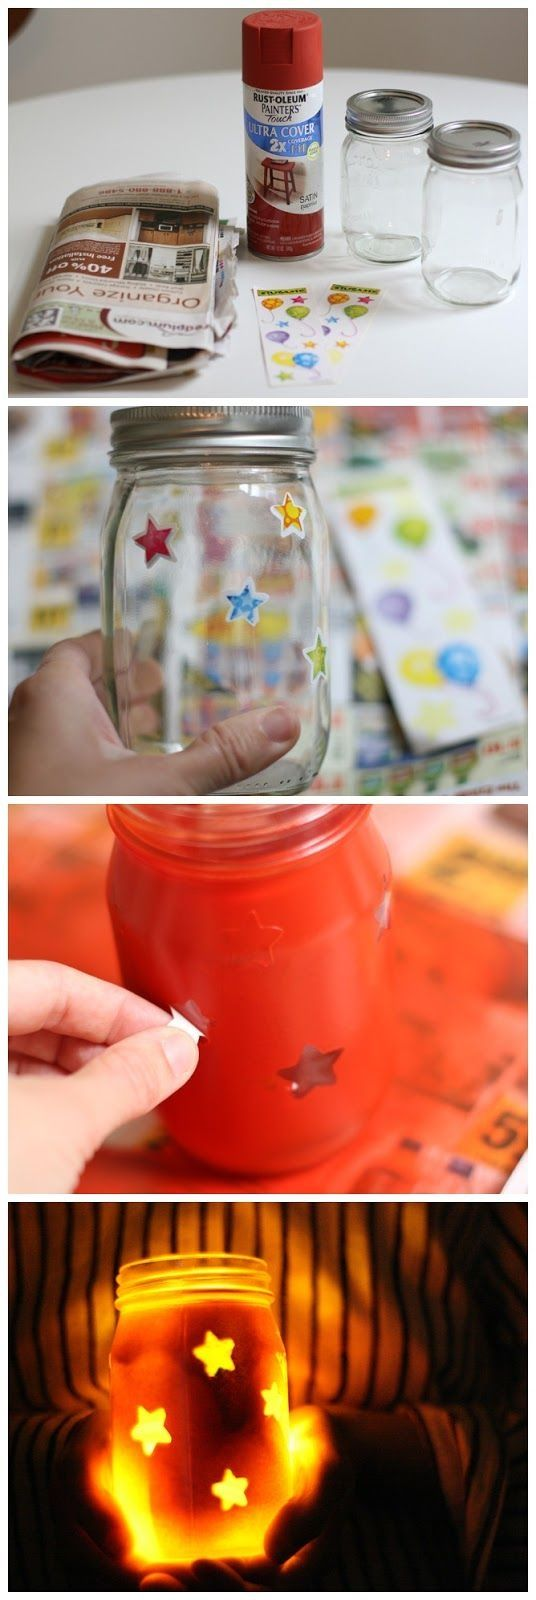 DIY: Fourth of July Star Jars by marcy